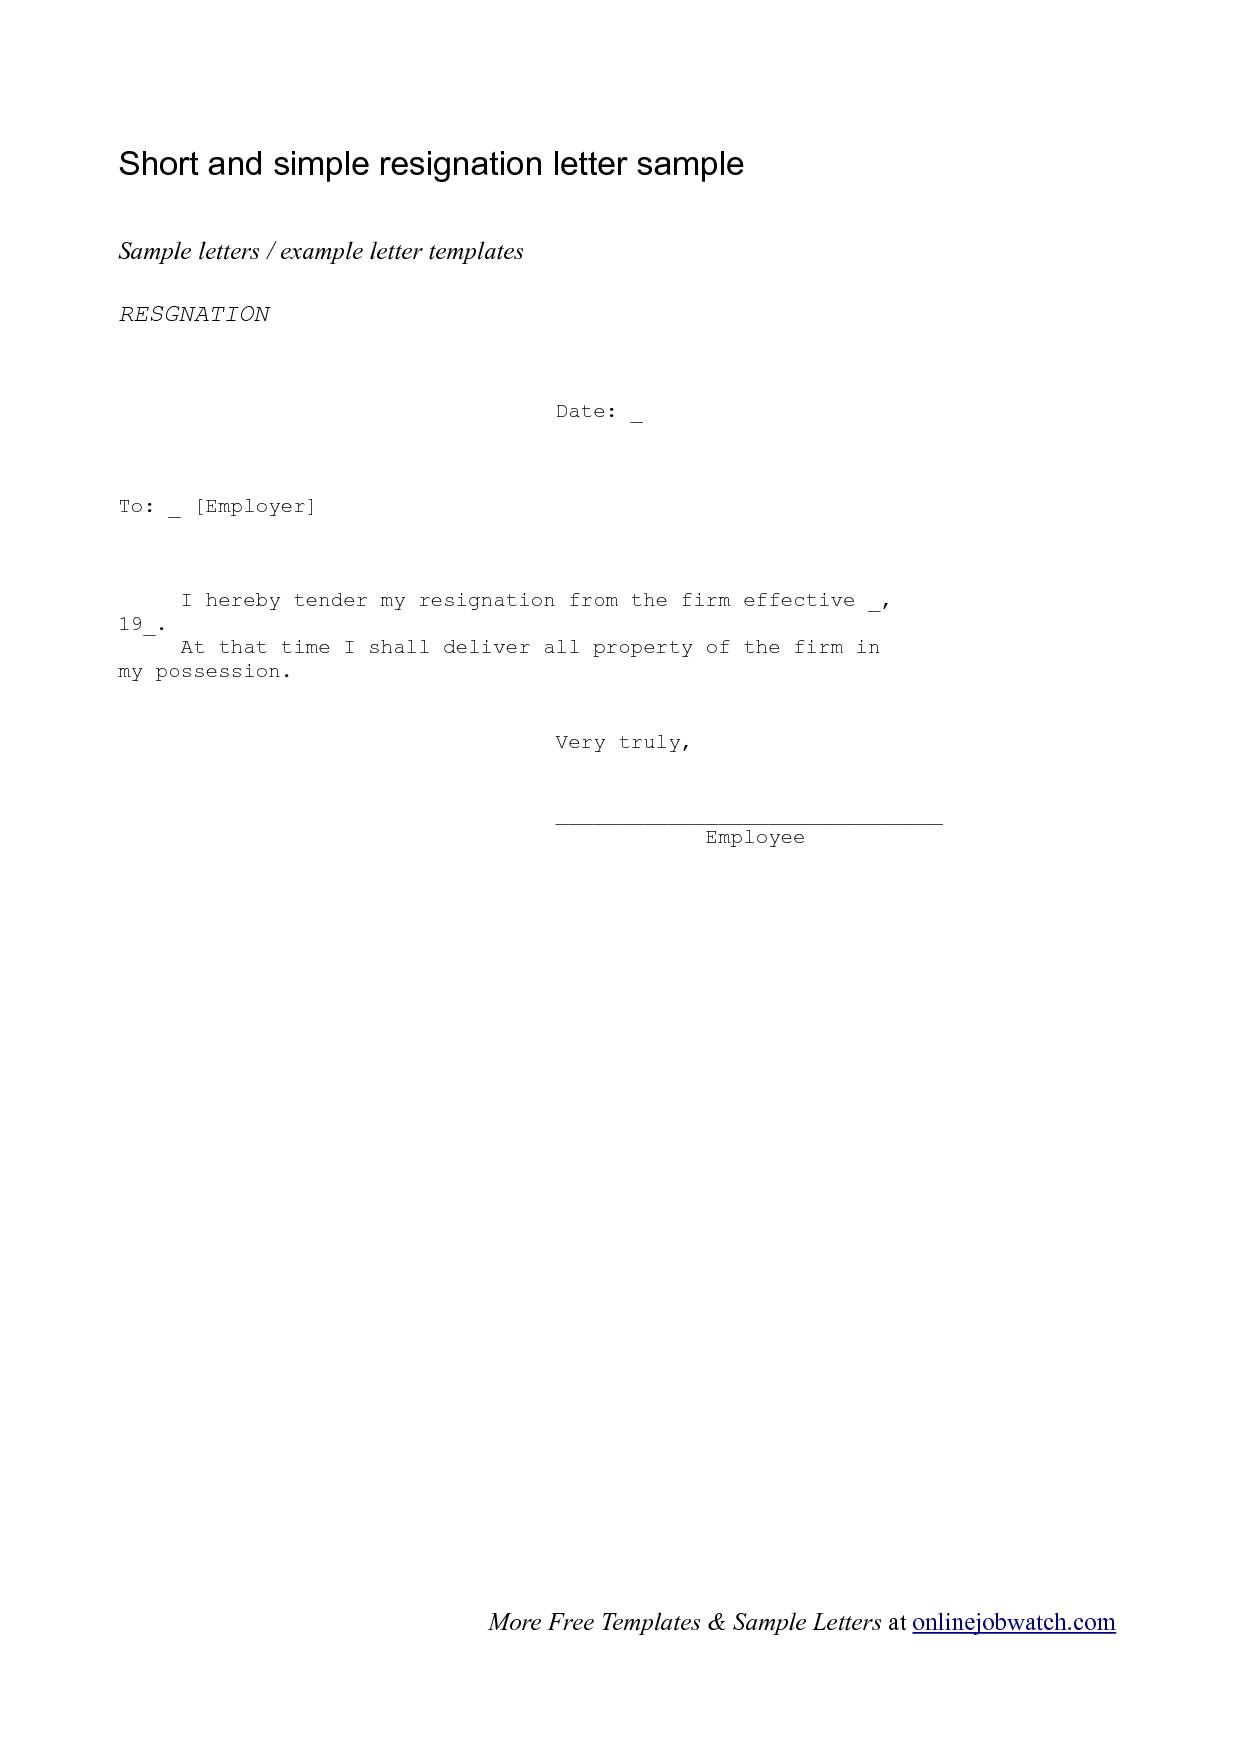 Simple Resignation Letter Sample  nit  Resignation